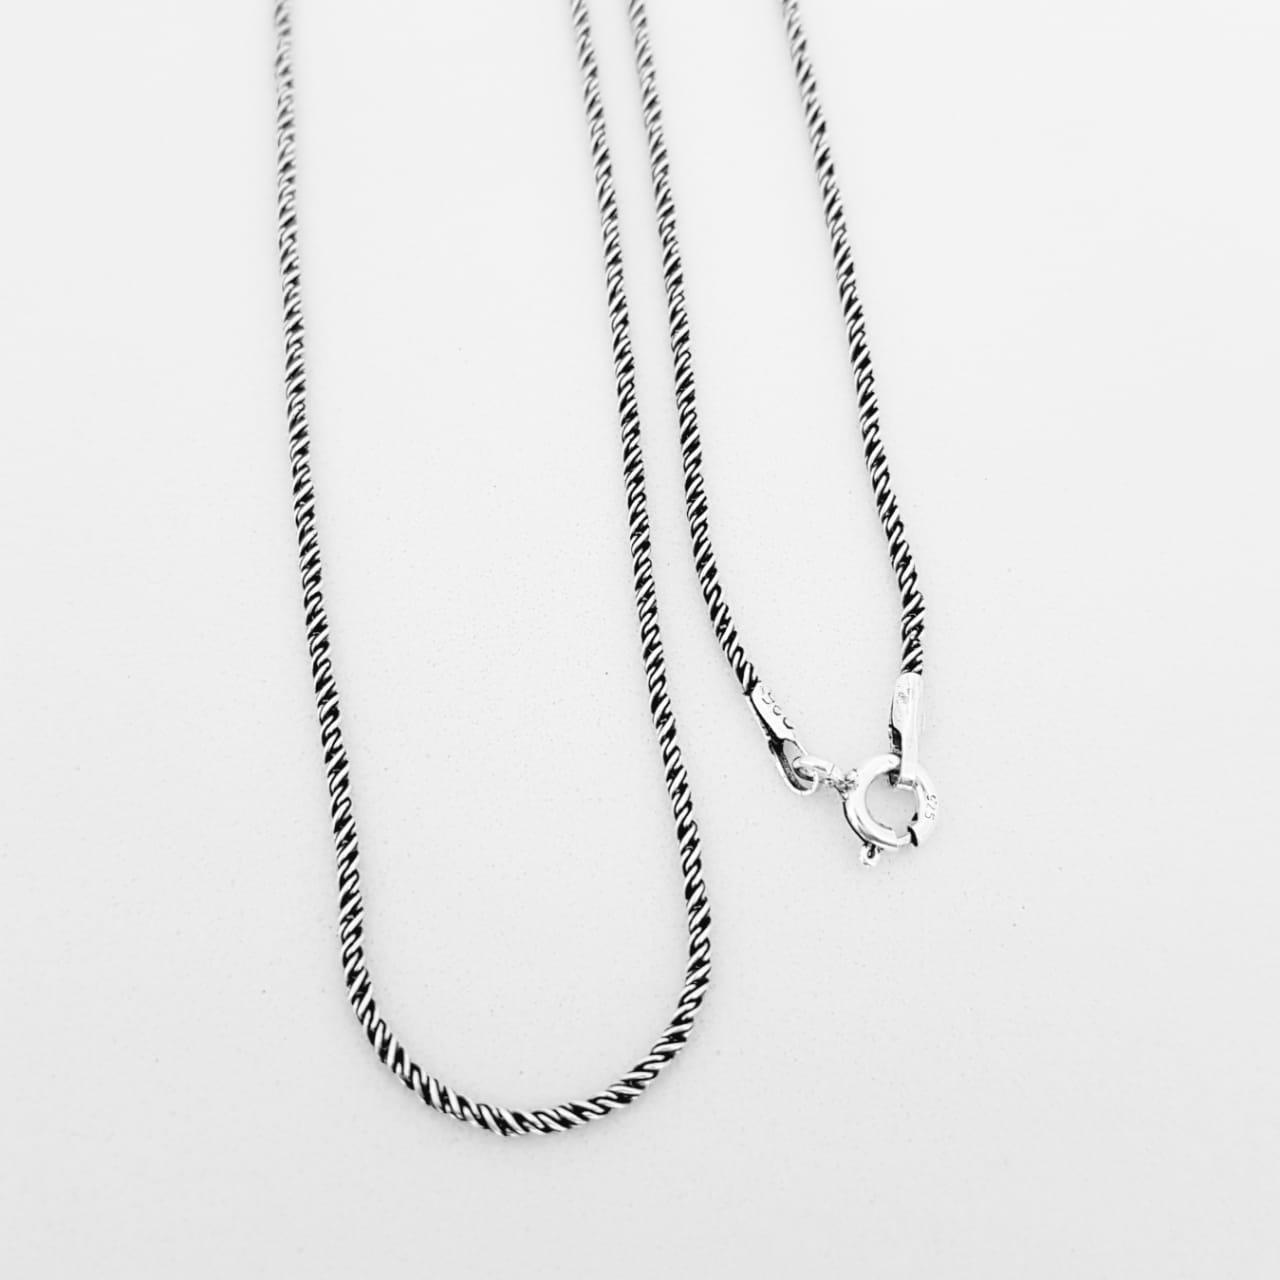 Corrente de Prata Trama Bali - 50 cm